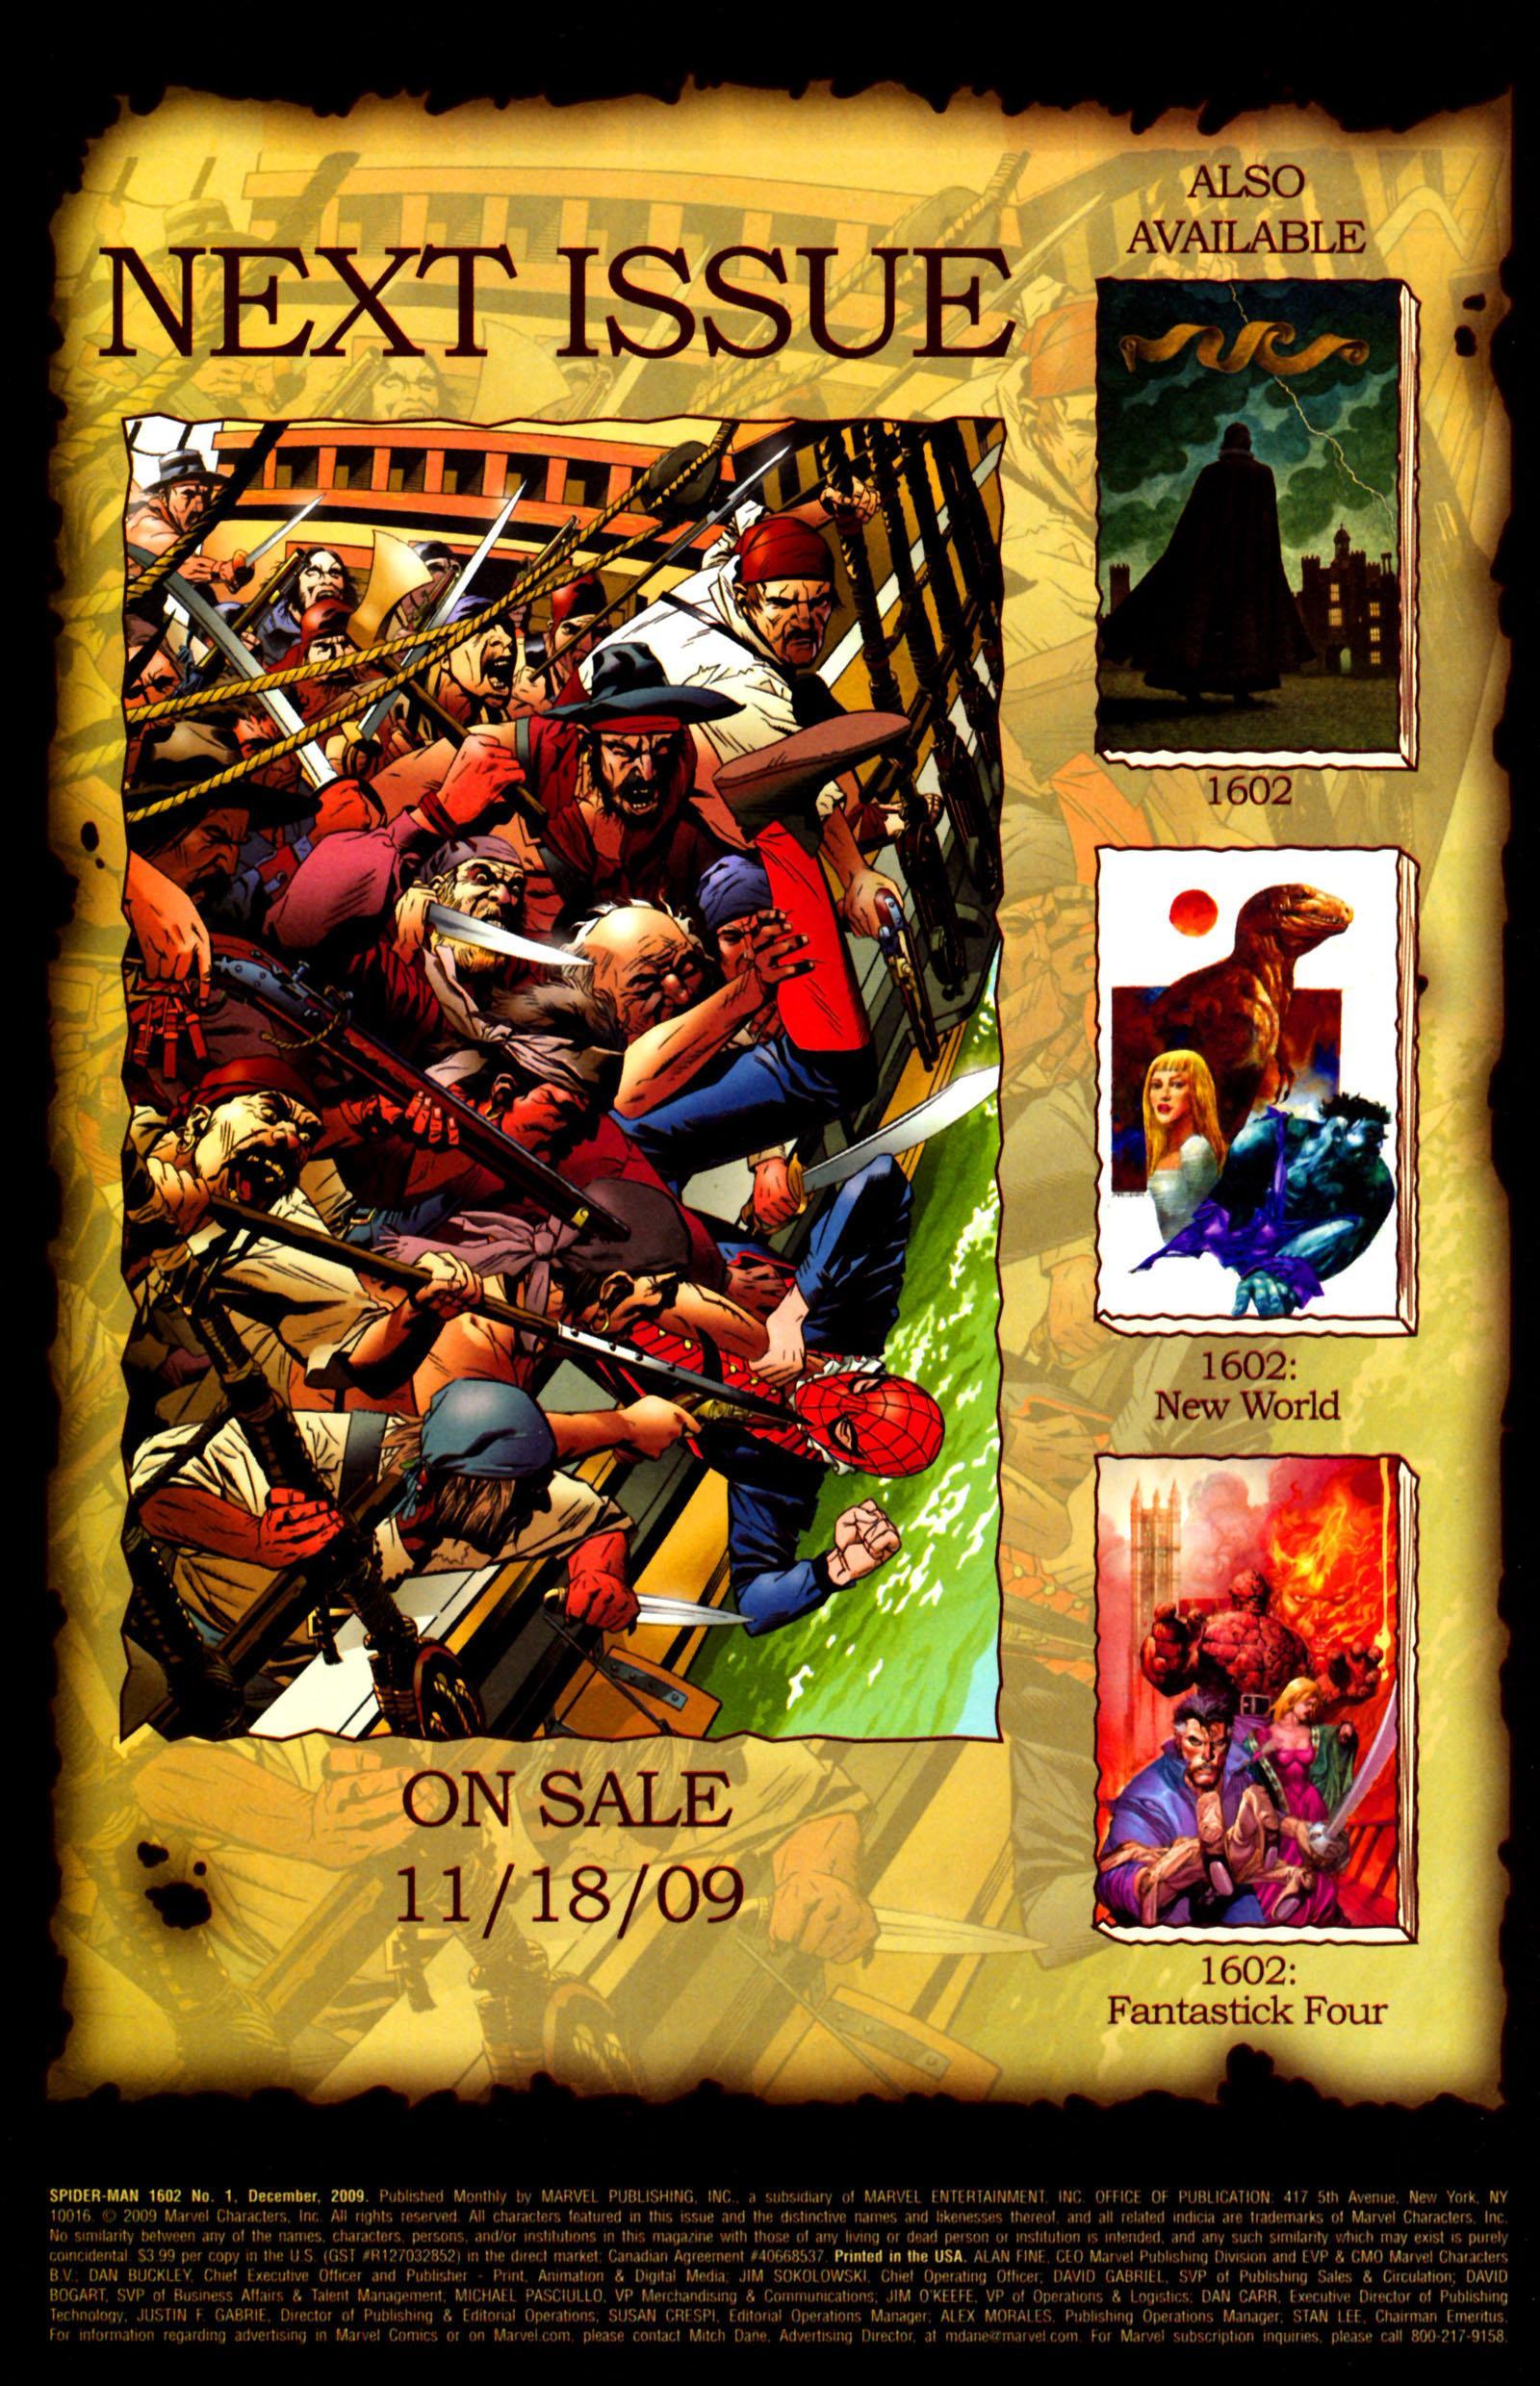 Spider-Man 1602 Vol 1 1 page 25 - Incidia Example.jpg